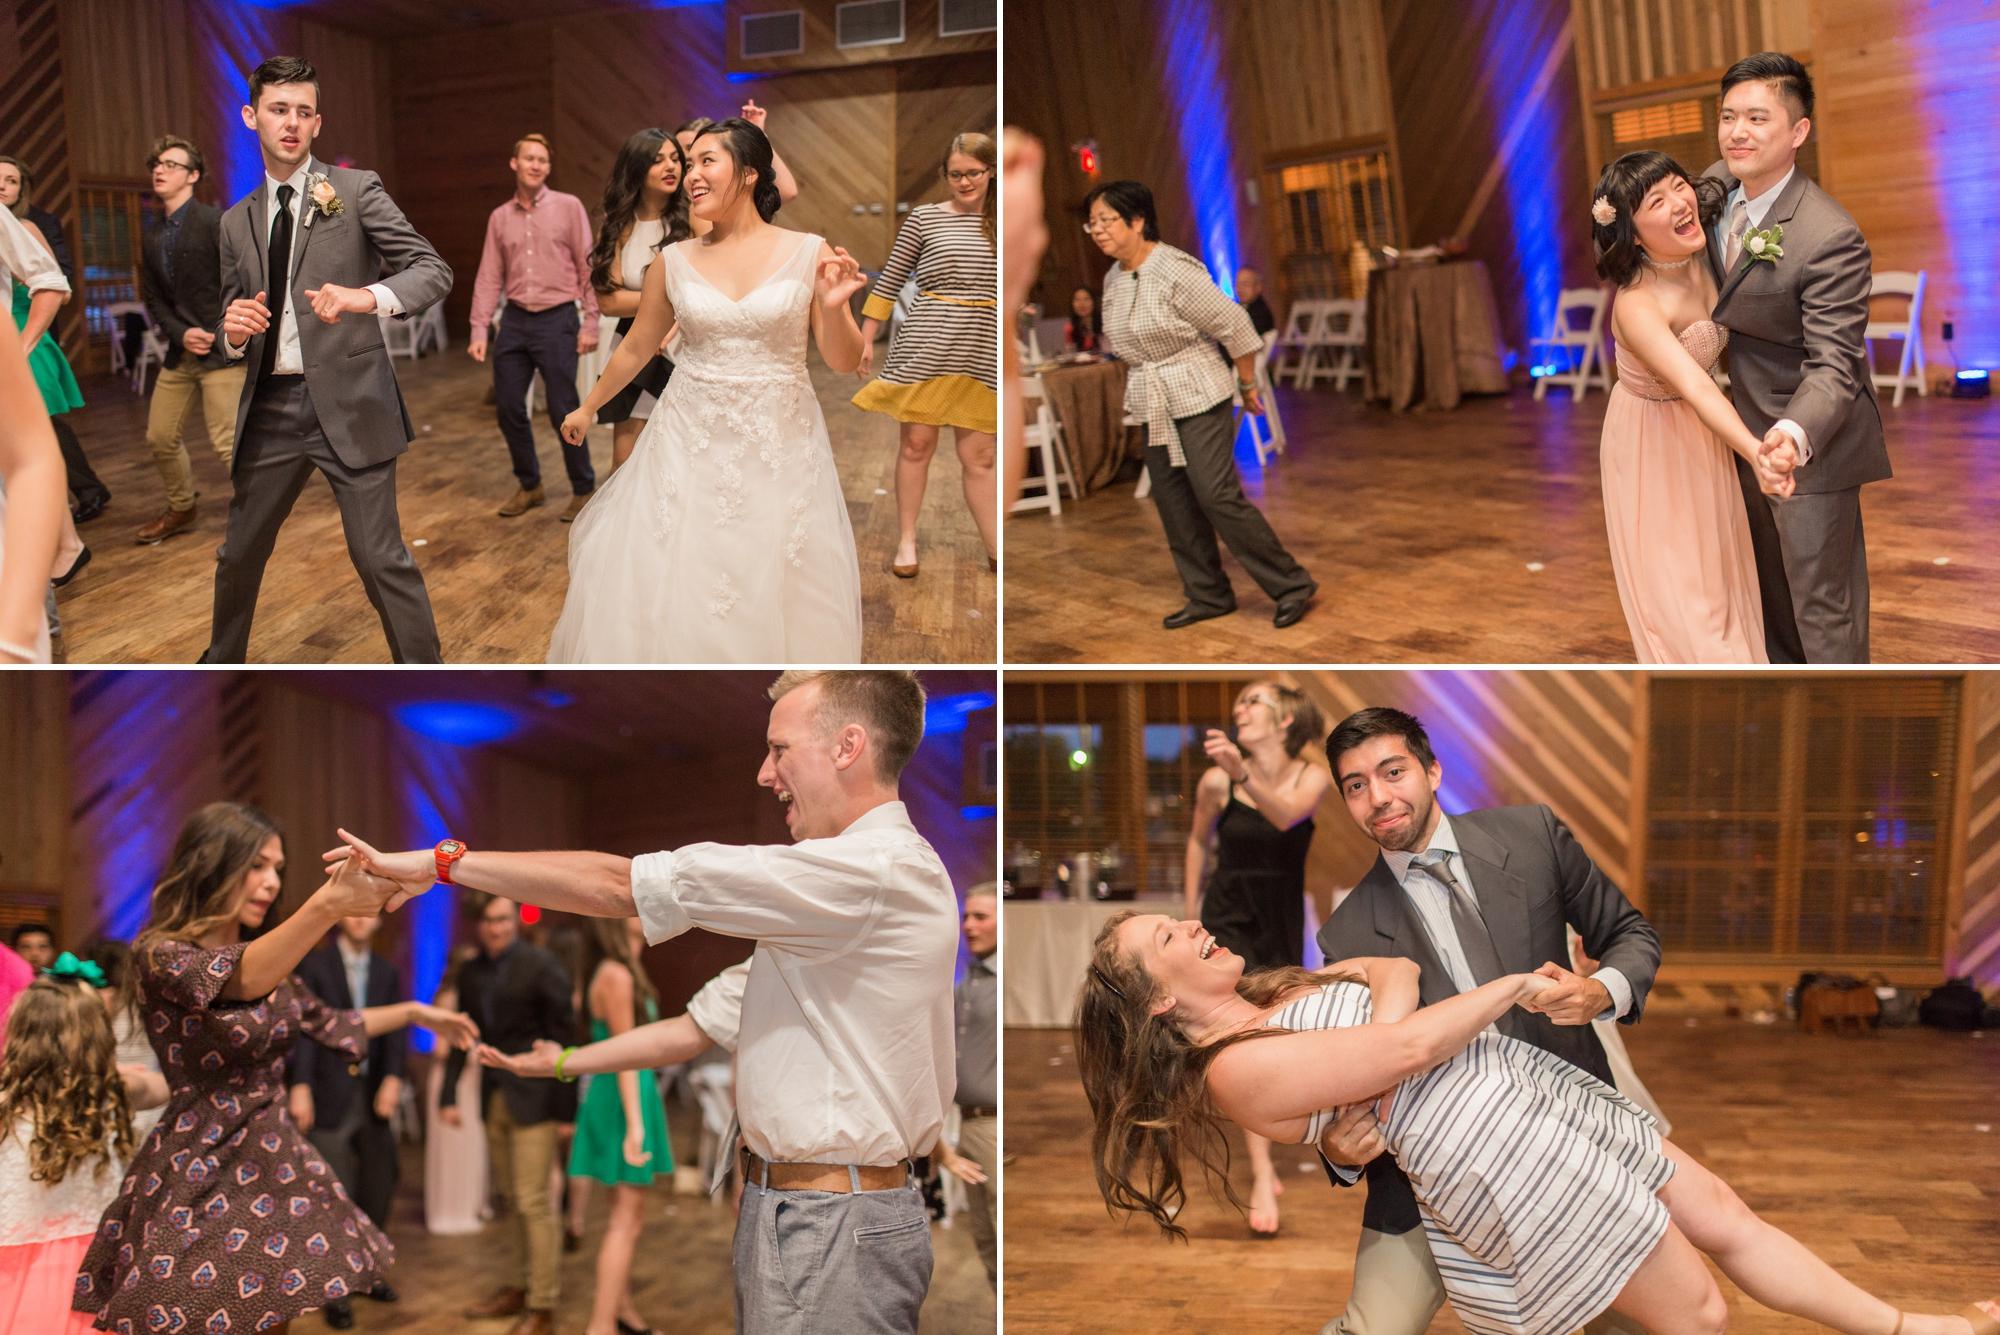 giles wedding blog 51.jpg